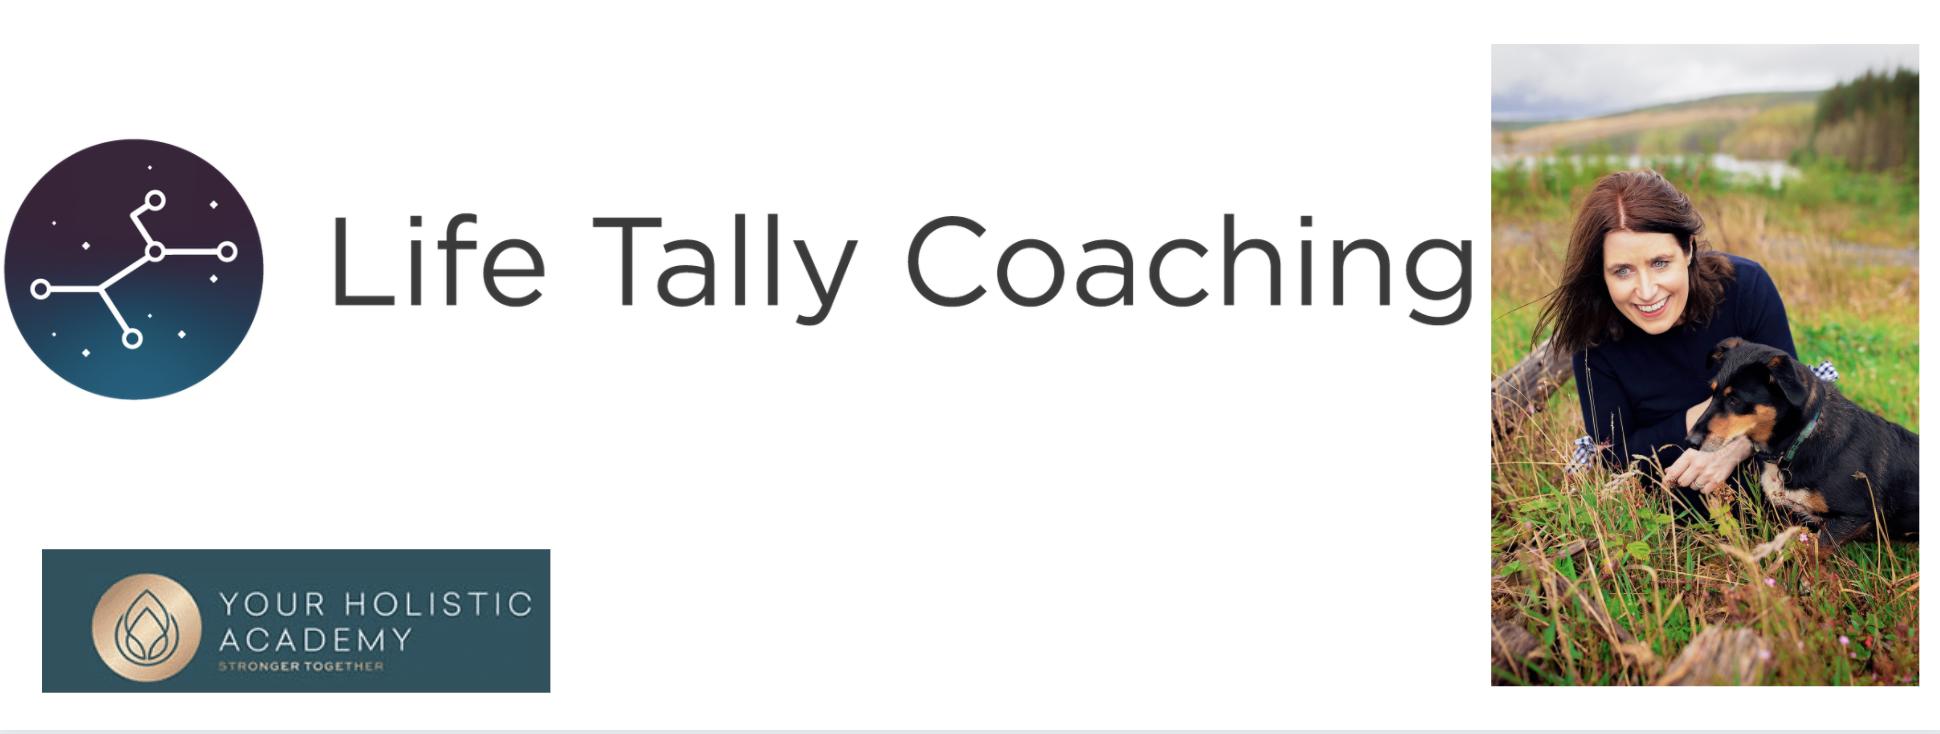 life tally coaching